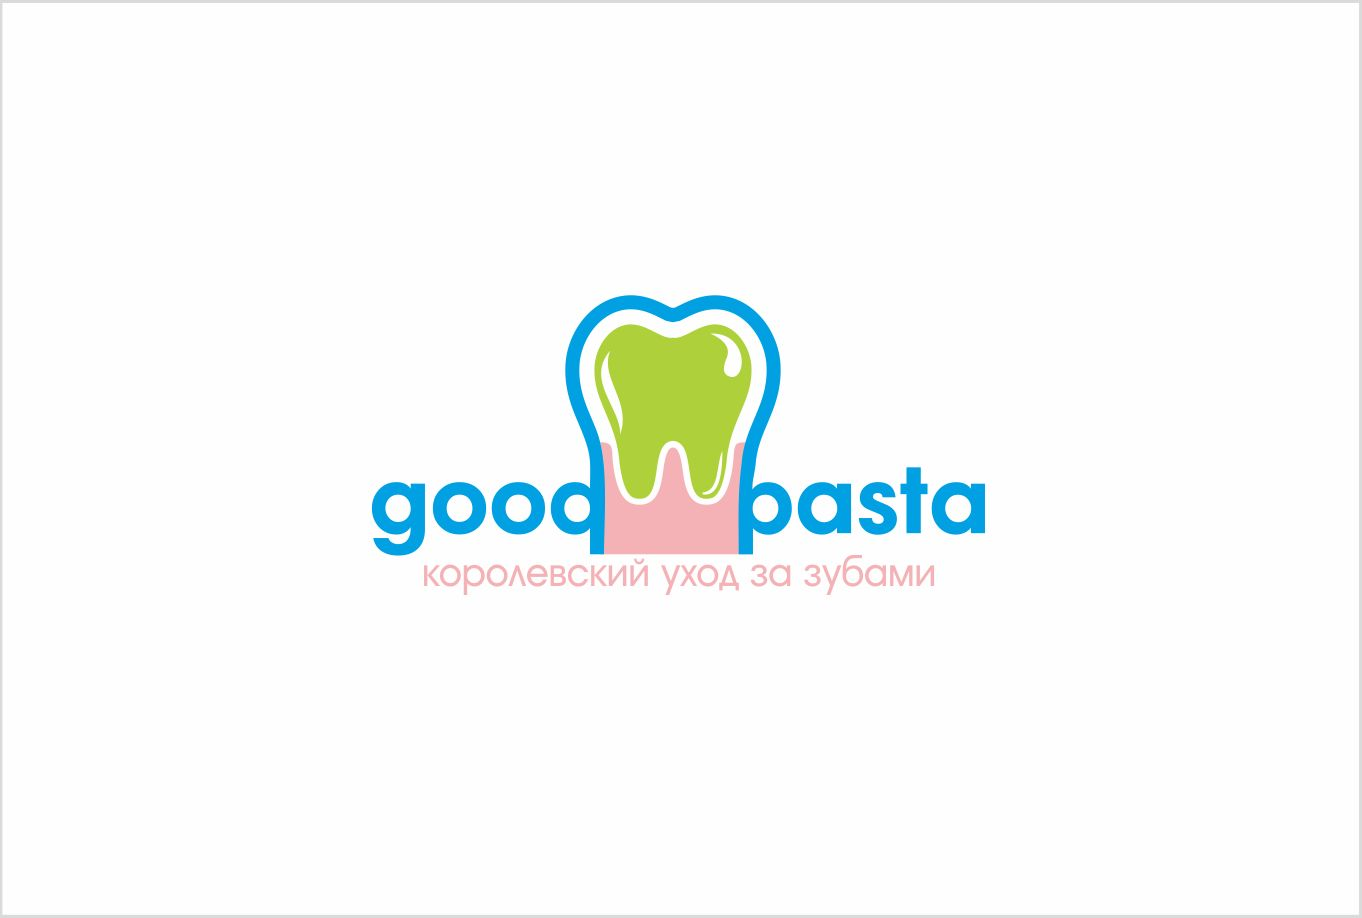 Логотип для интернет-магазина goodpasta.ru - дизайнер W91I